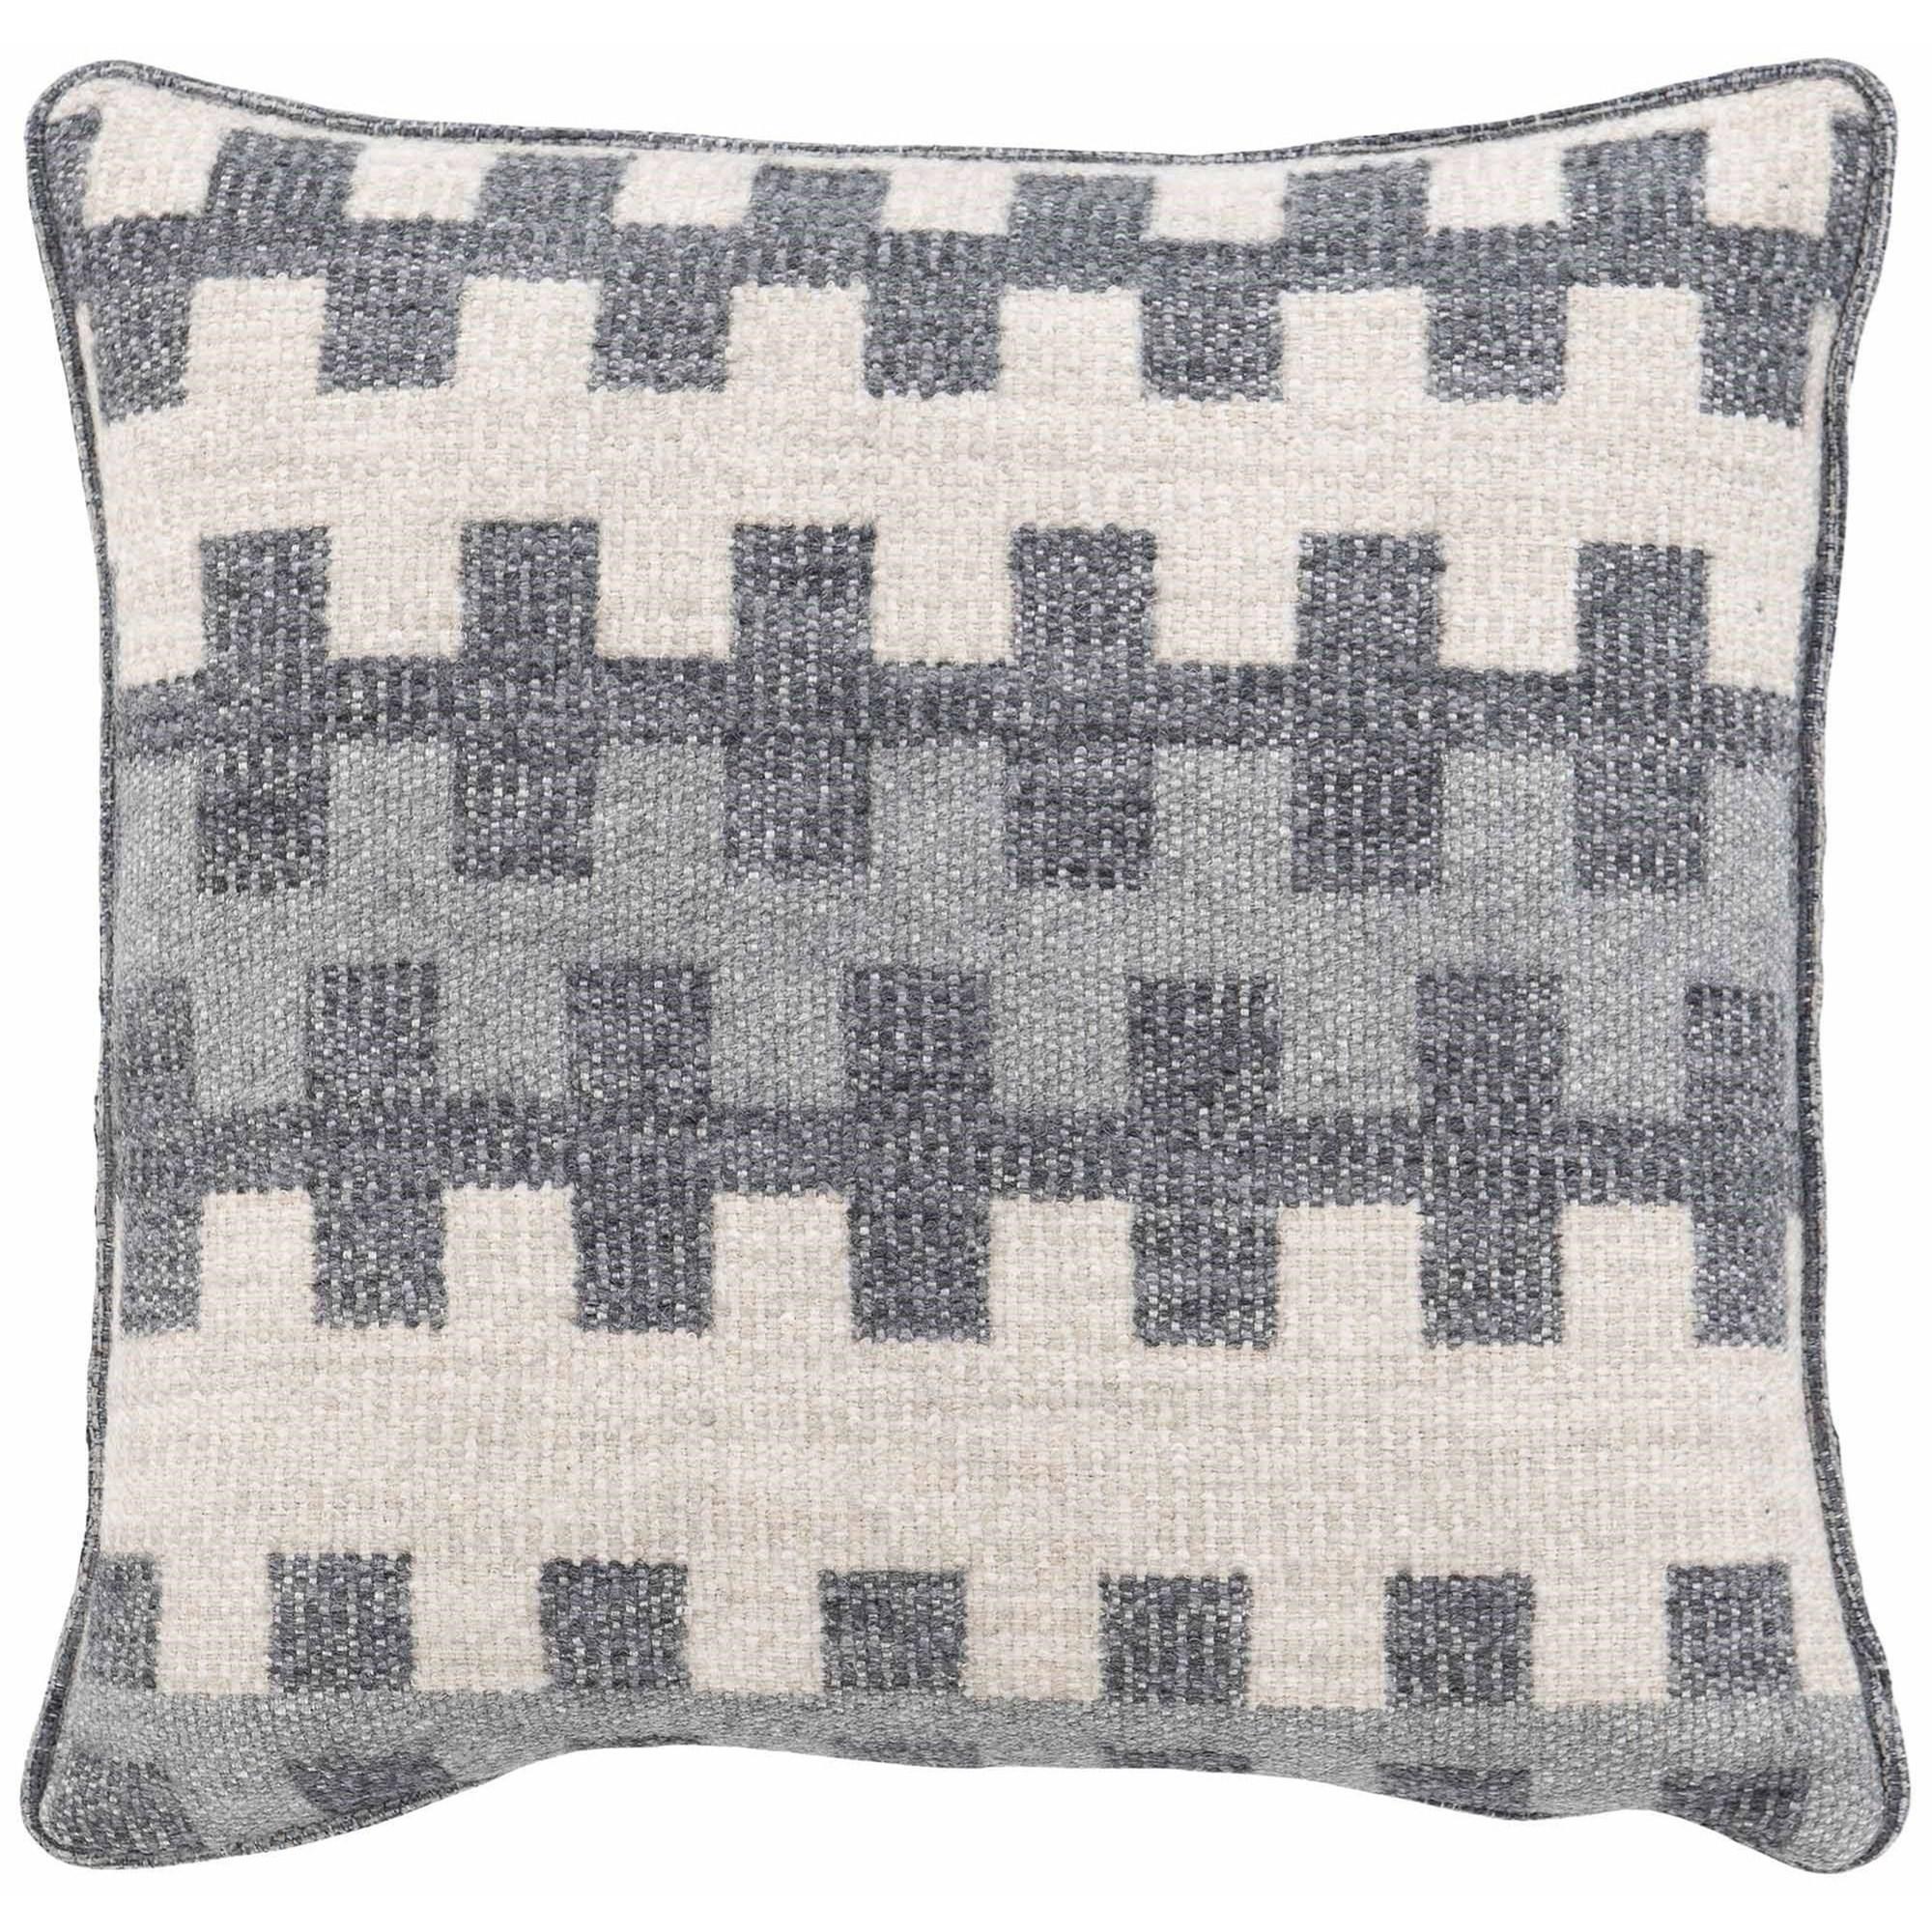 "Custom Decorative Pillows Knife Edge Square w/welt (21"" x 21"") at Williams & Kay"